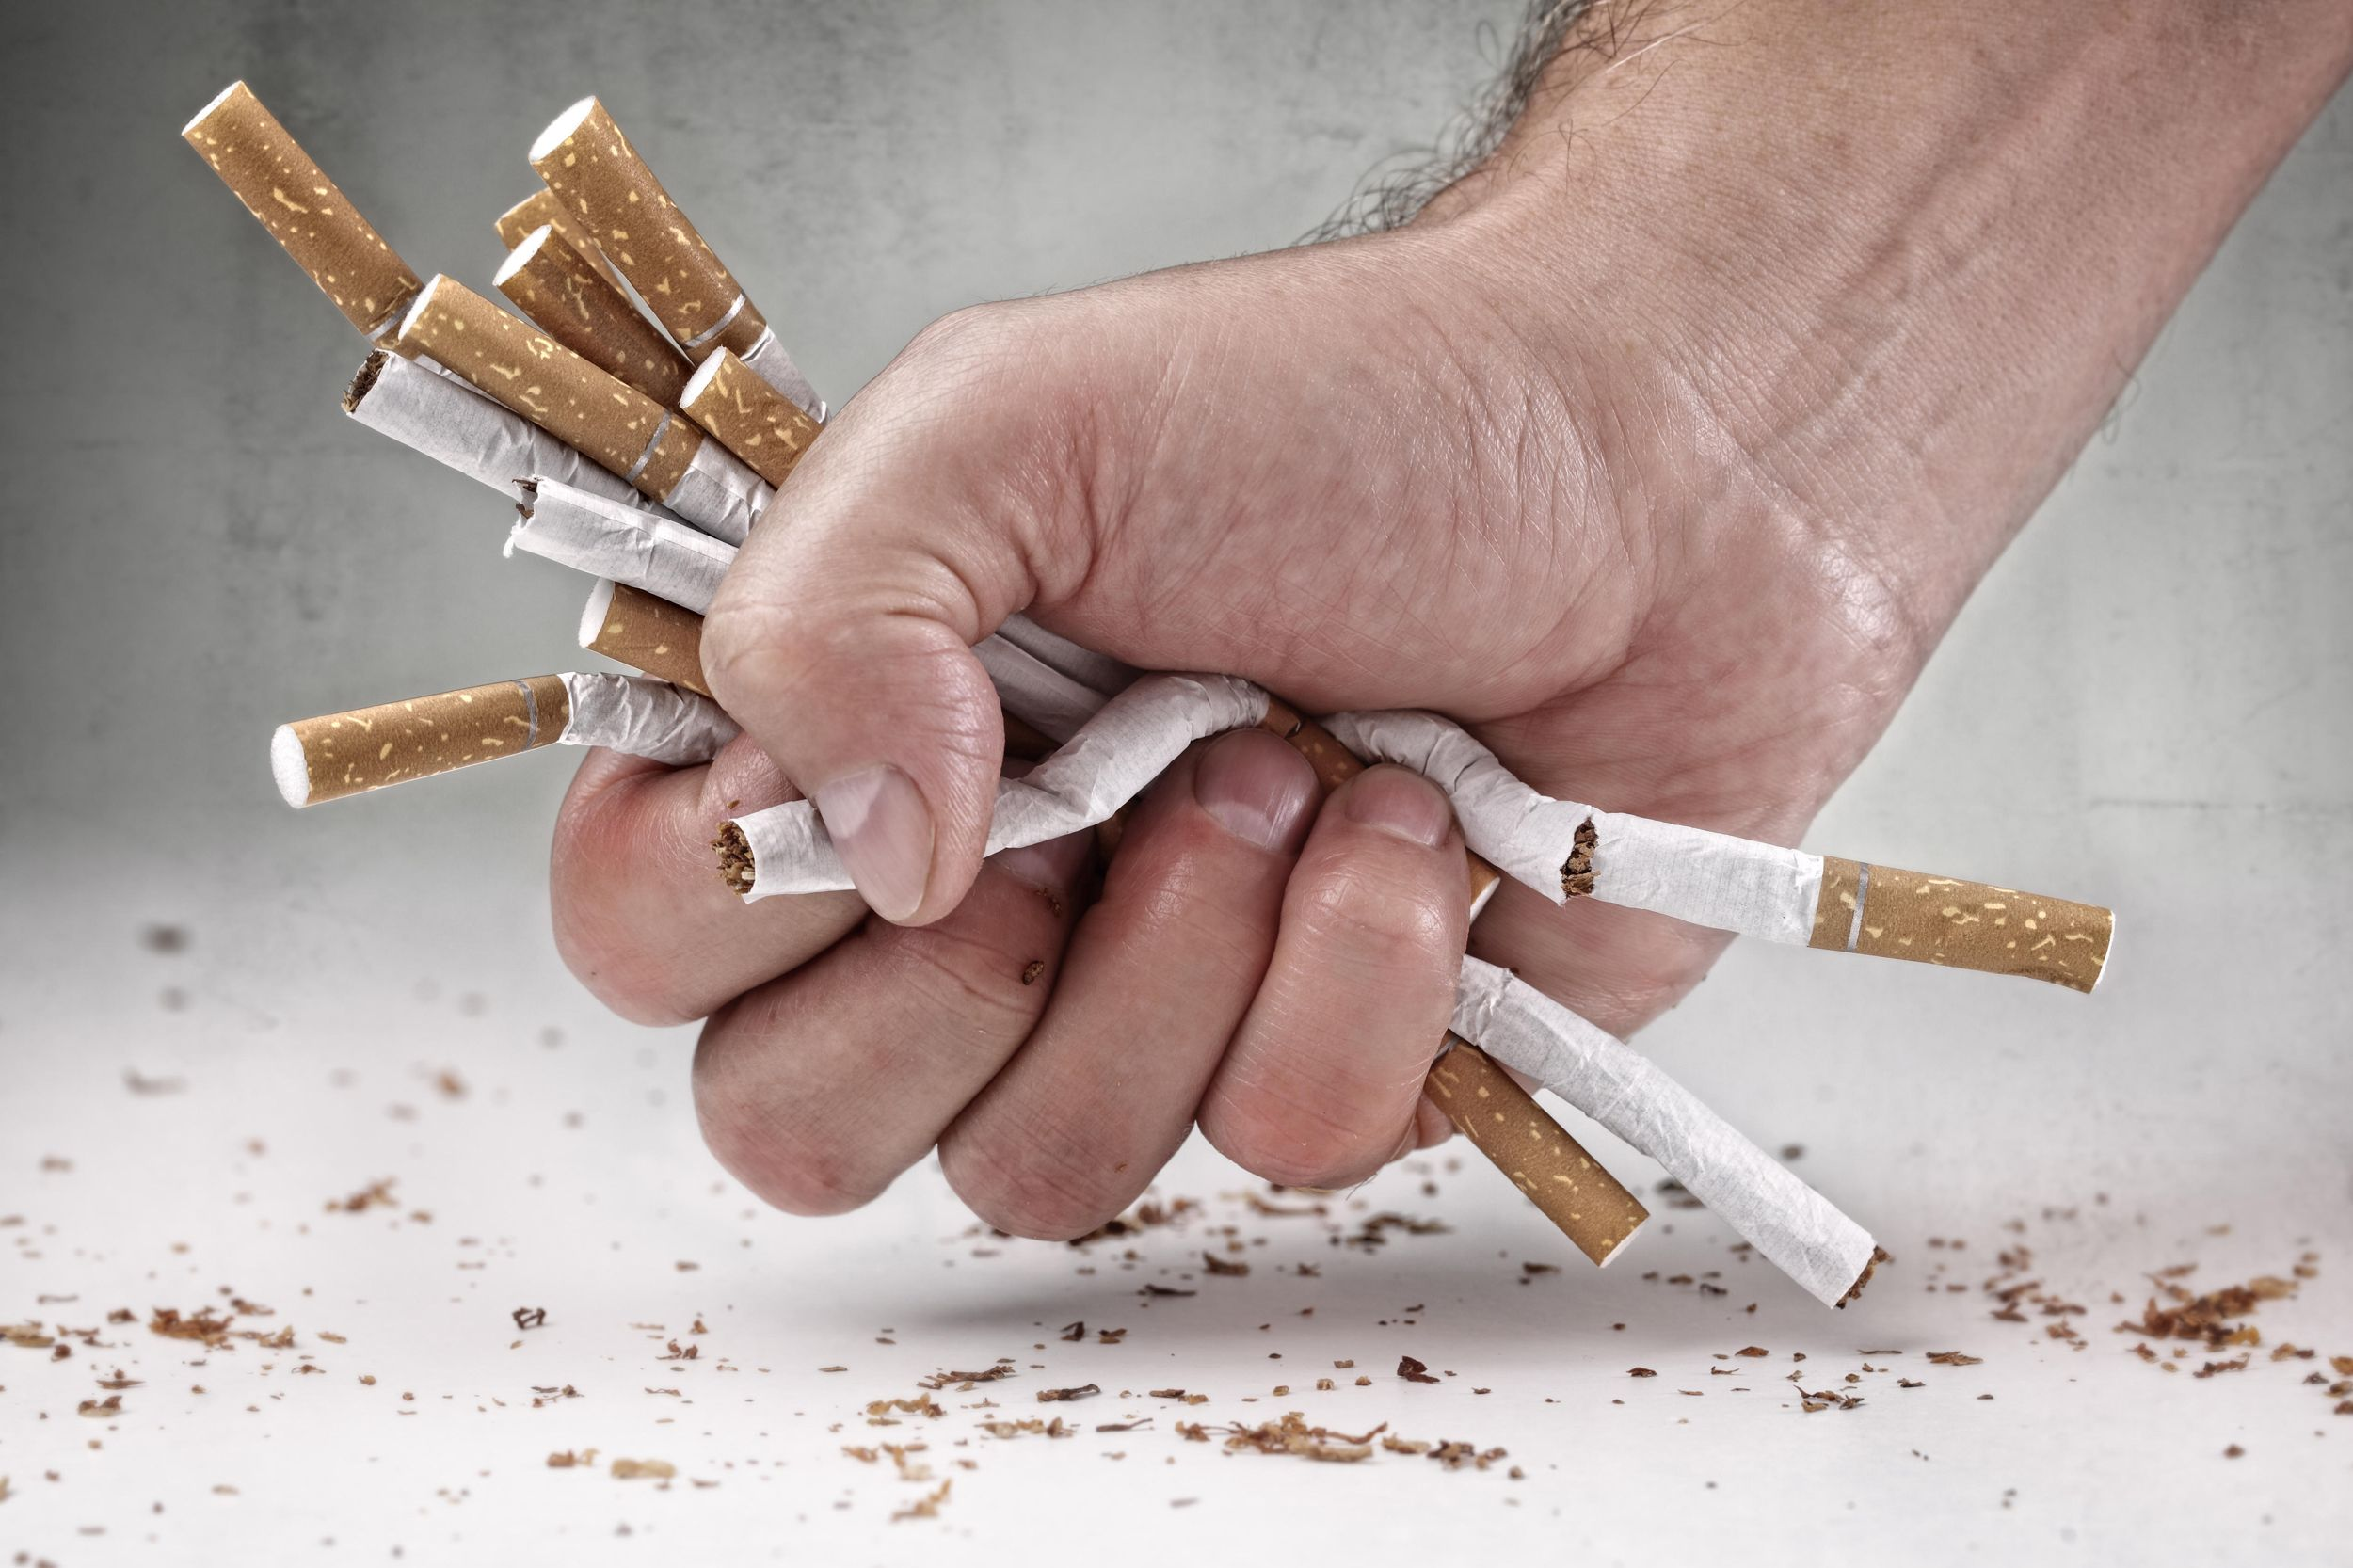 171121-tobacco-ac-715p_7d22575908d6ae1447b85658916f4e7e